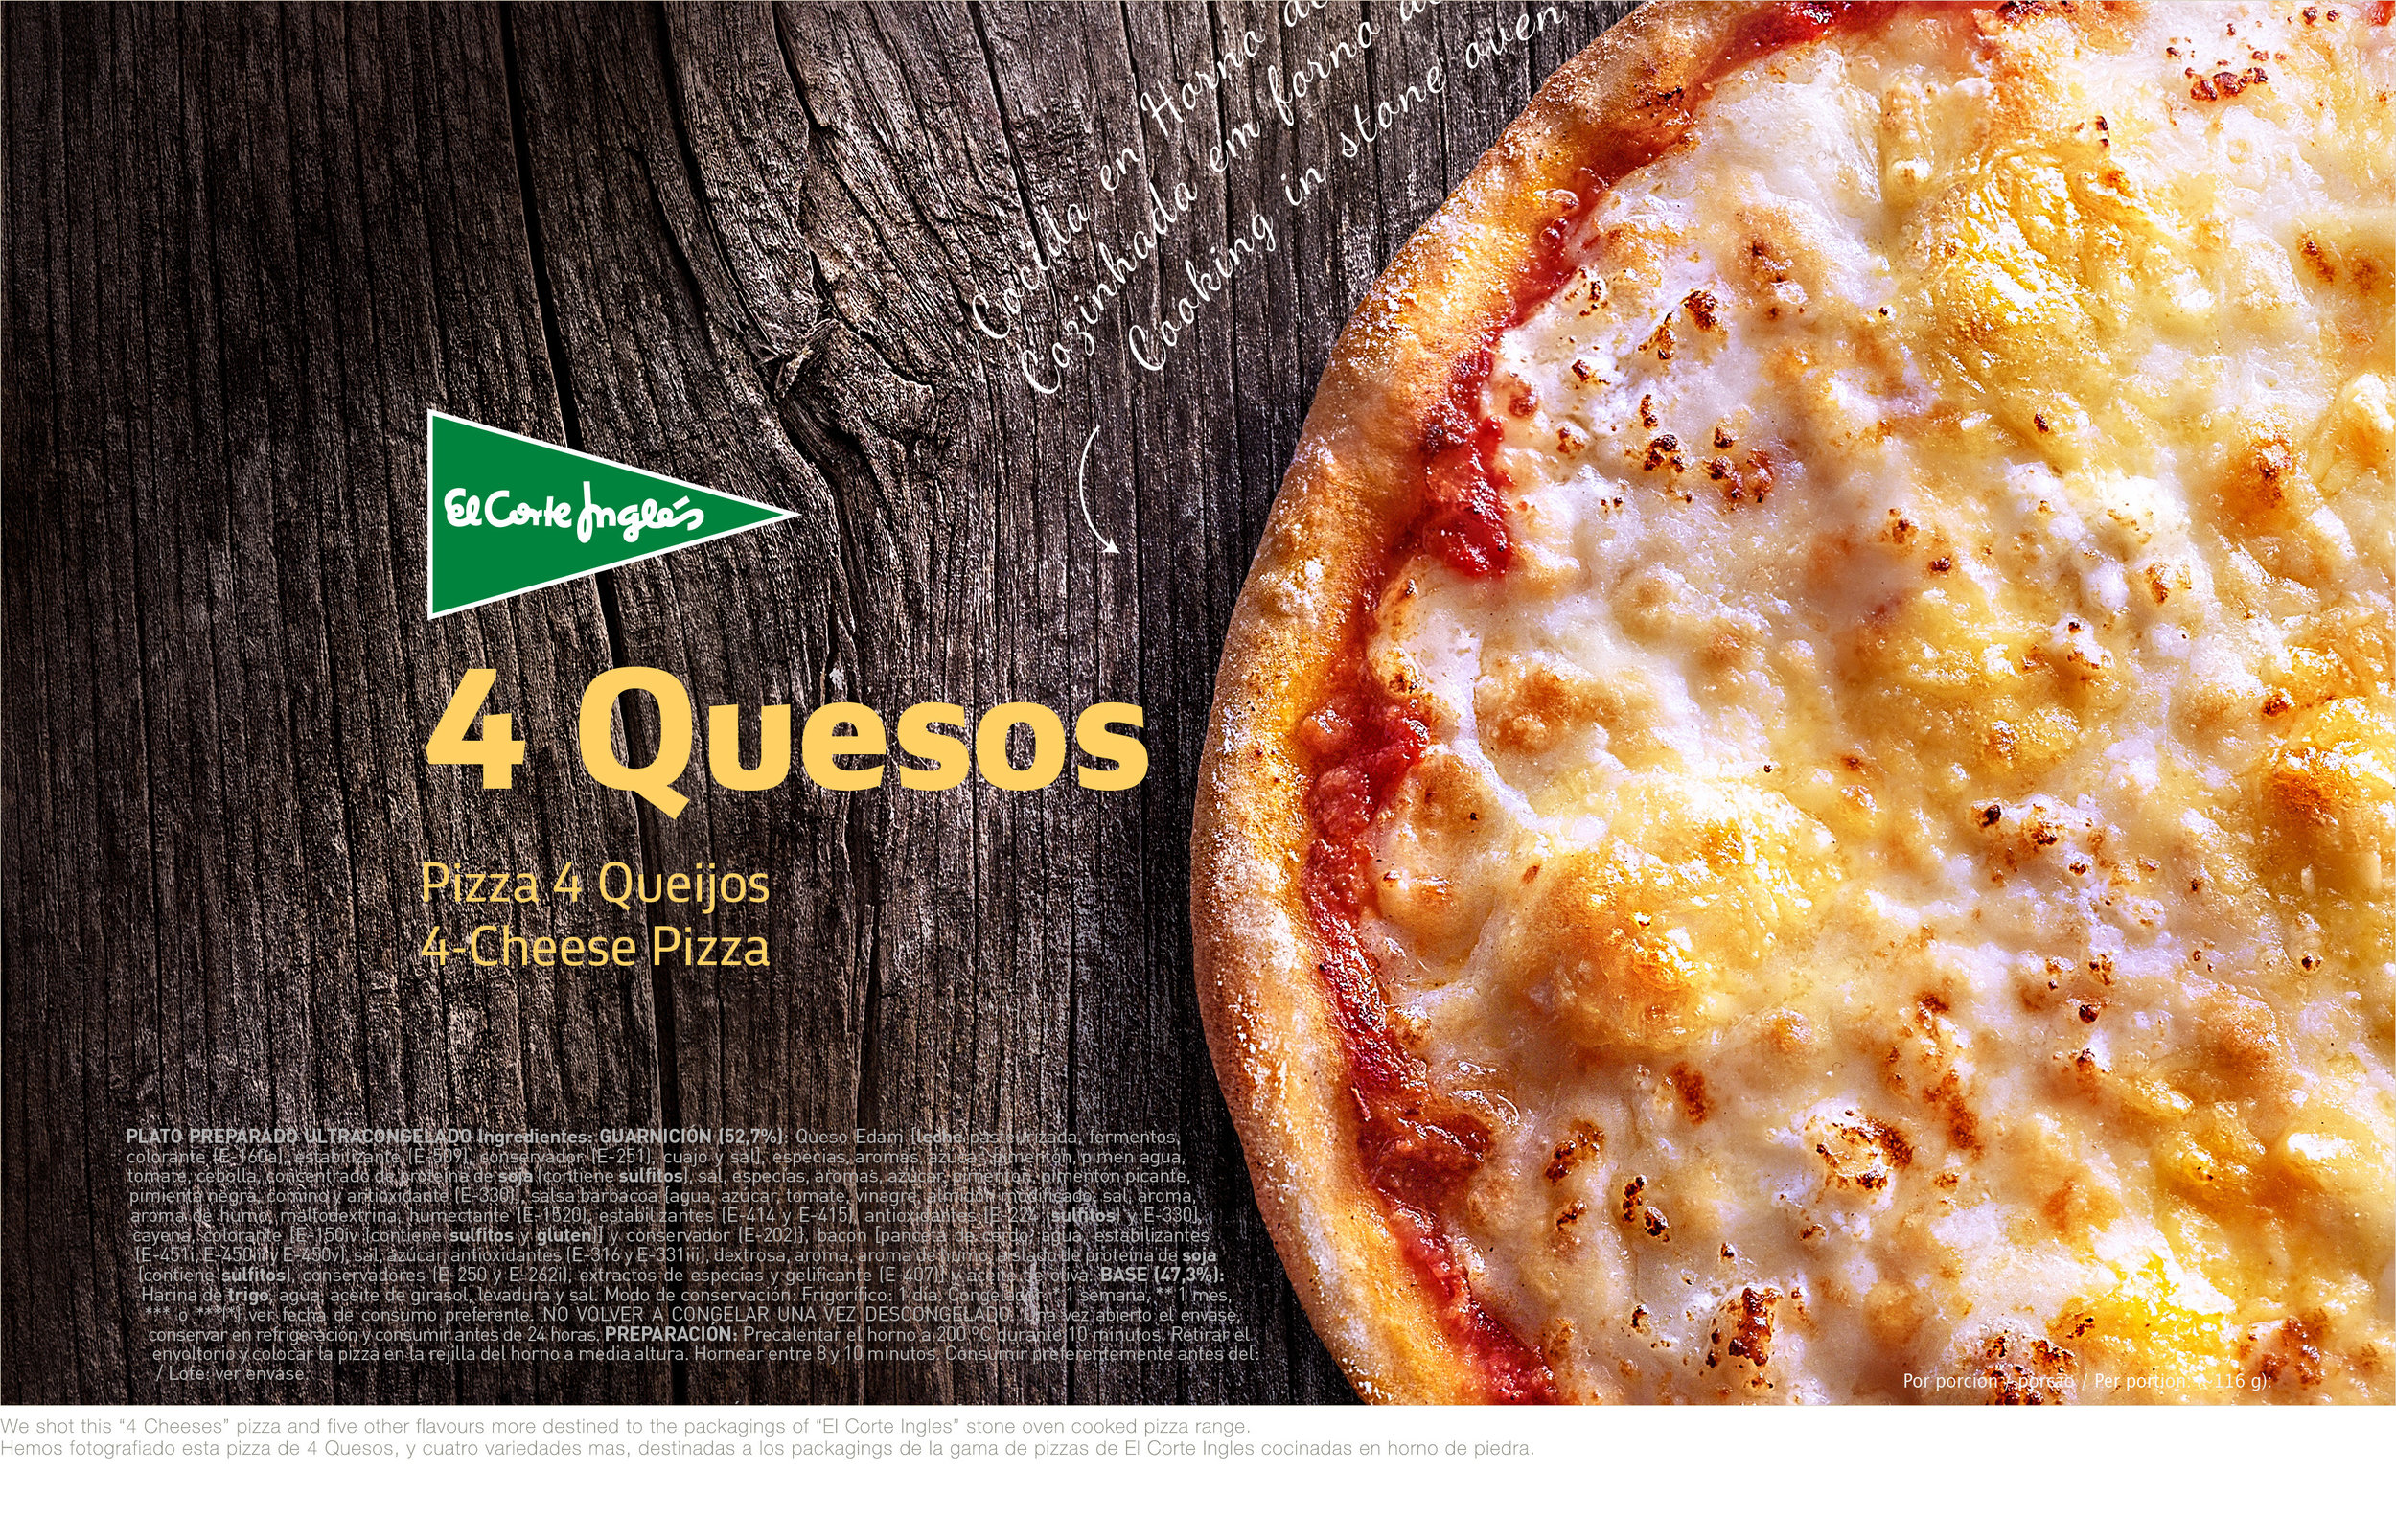 Pizza-El-Corte-Ingles-4-Quesos-v03.jpg